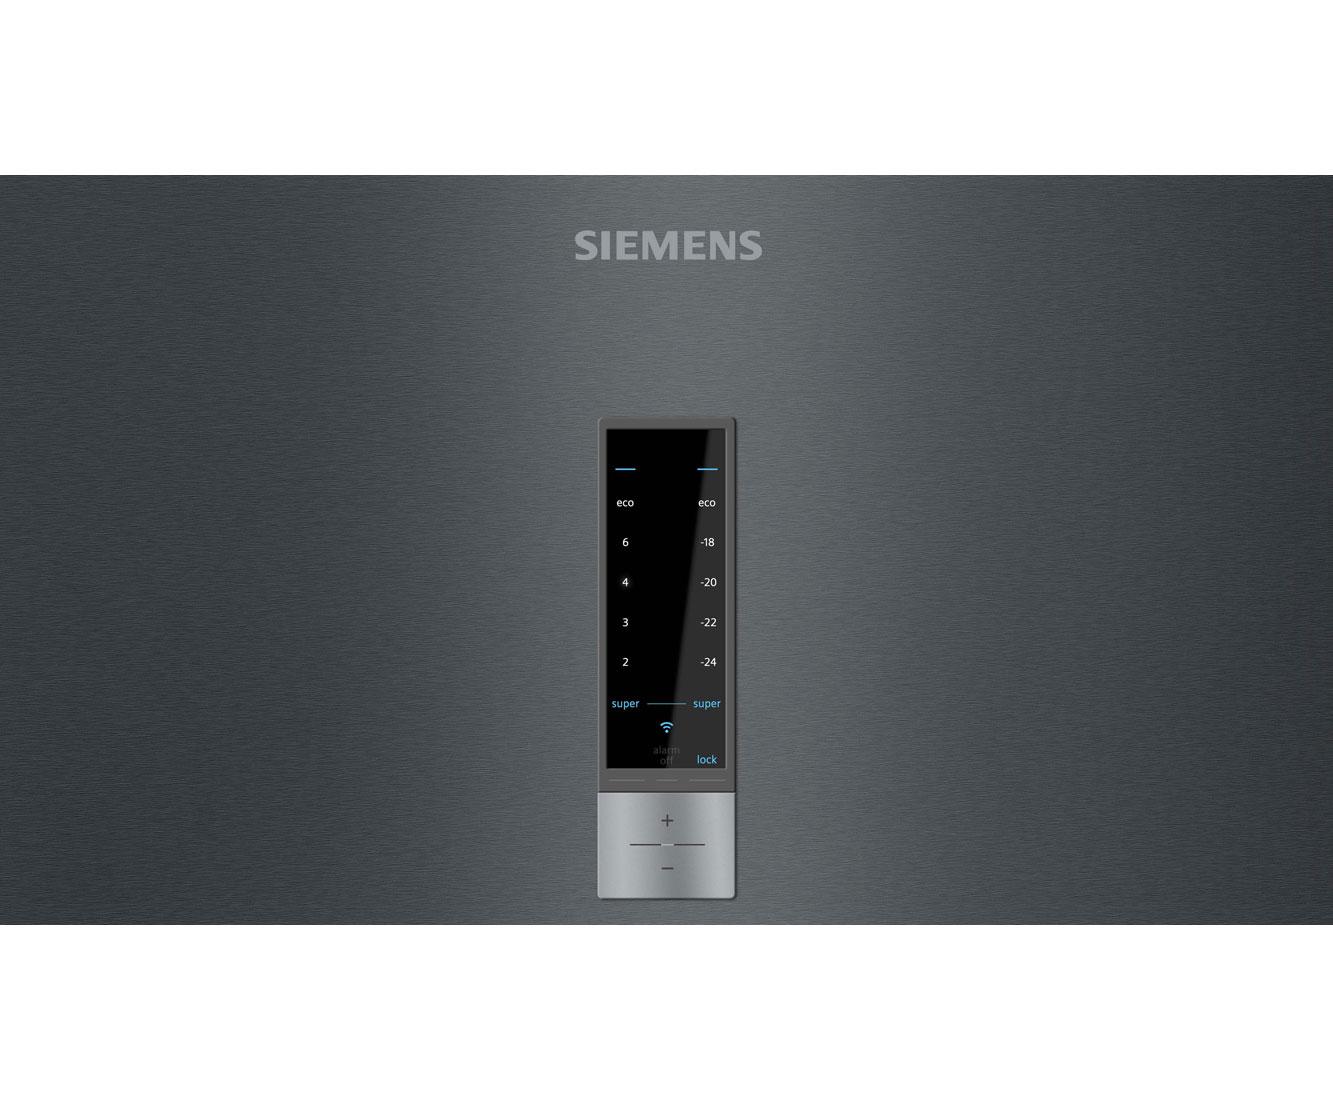 Siemens Kühlschrank Lock : Siemens iq300 kg36nxx4a kühlschrank schwarz edelstahl a